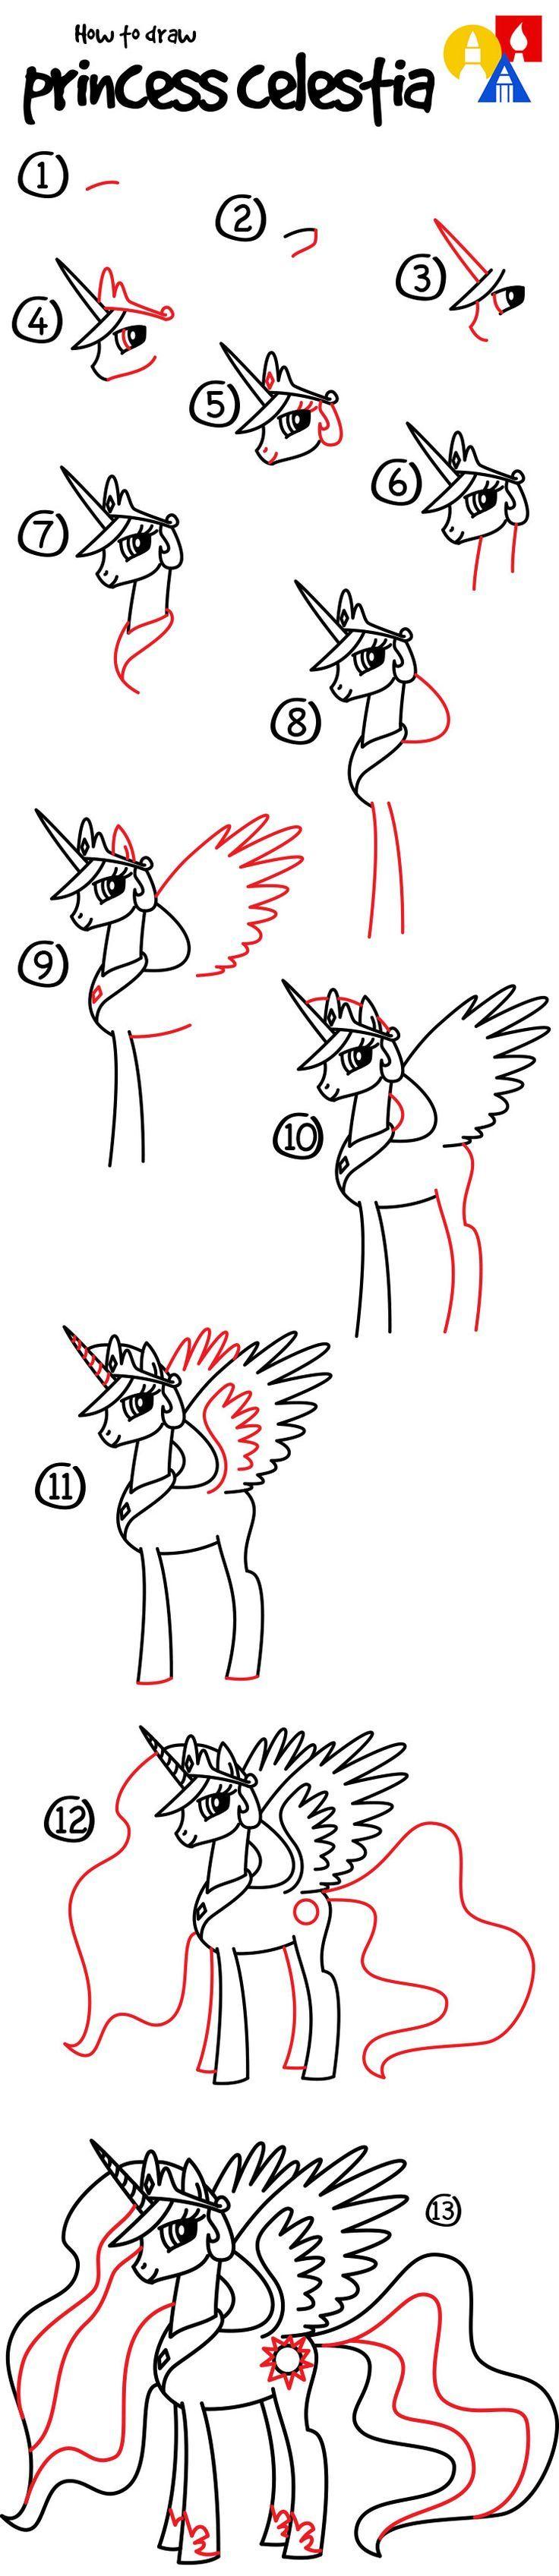 Beautiful Learn How To Draw Princess Celestia!